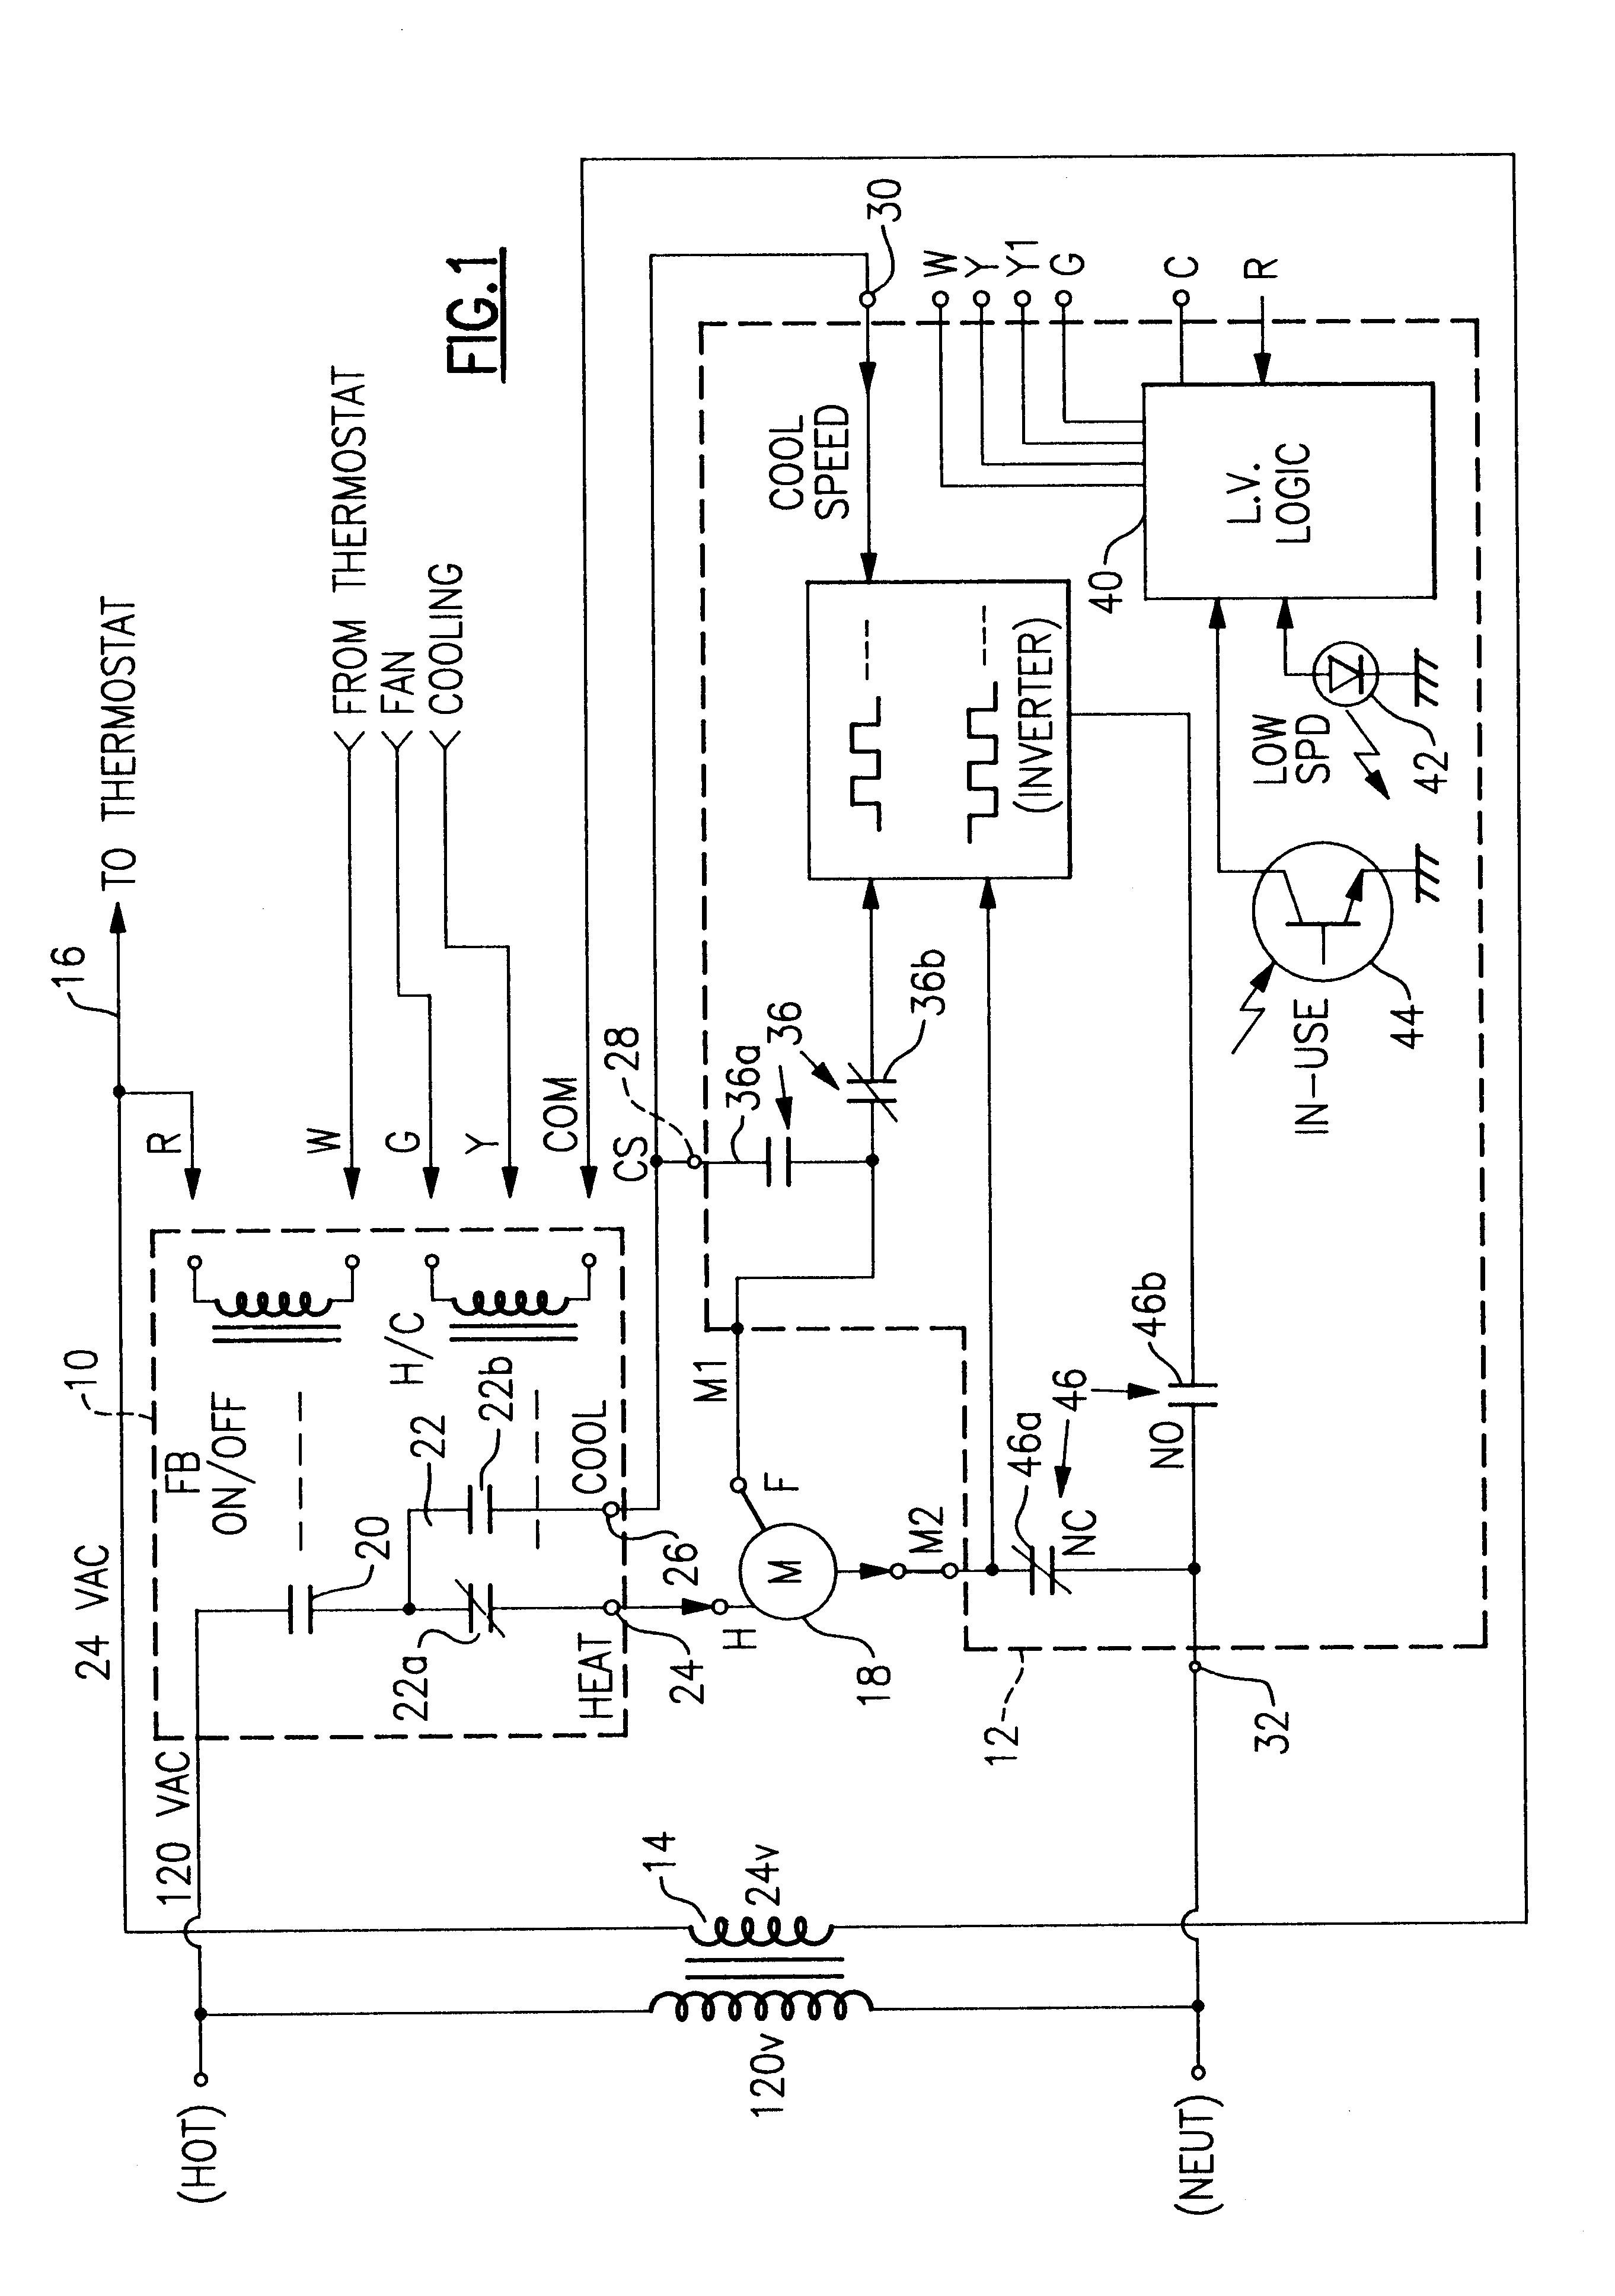 GX_4423] Century Dl1056 Wiring Diagram Schematic WiringPuti Pila Carn Weasi Estep Wigeg Mohammedshrine Librar Wiring 101